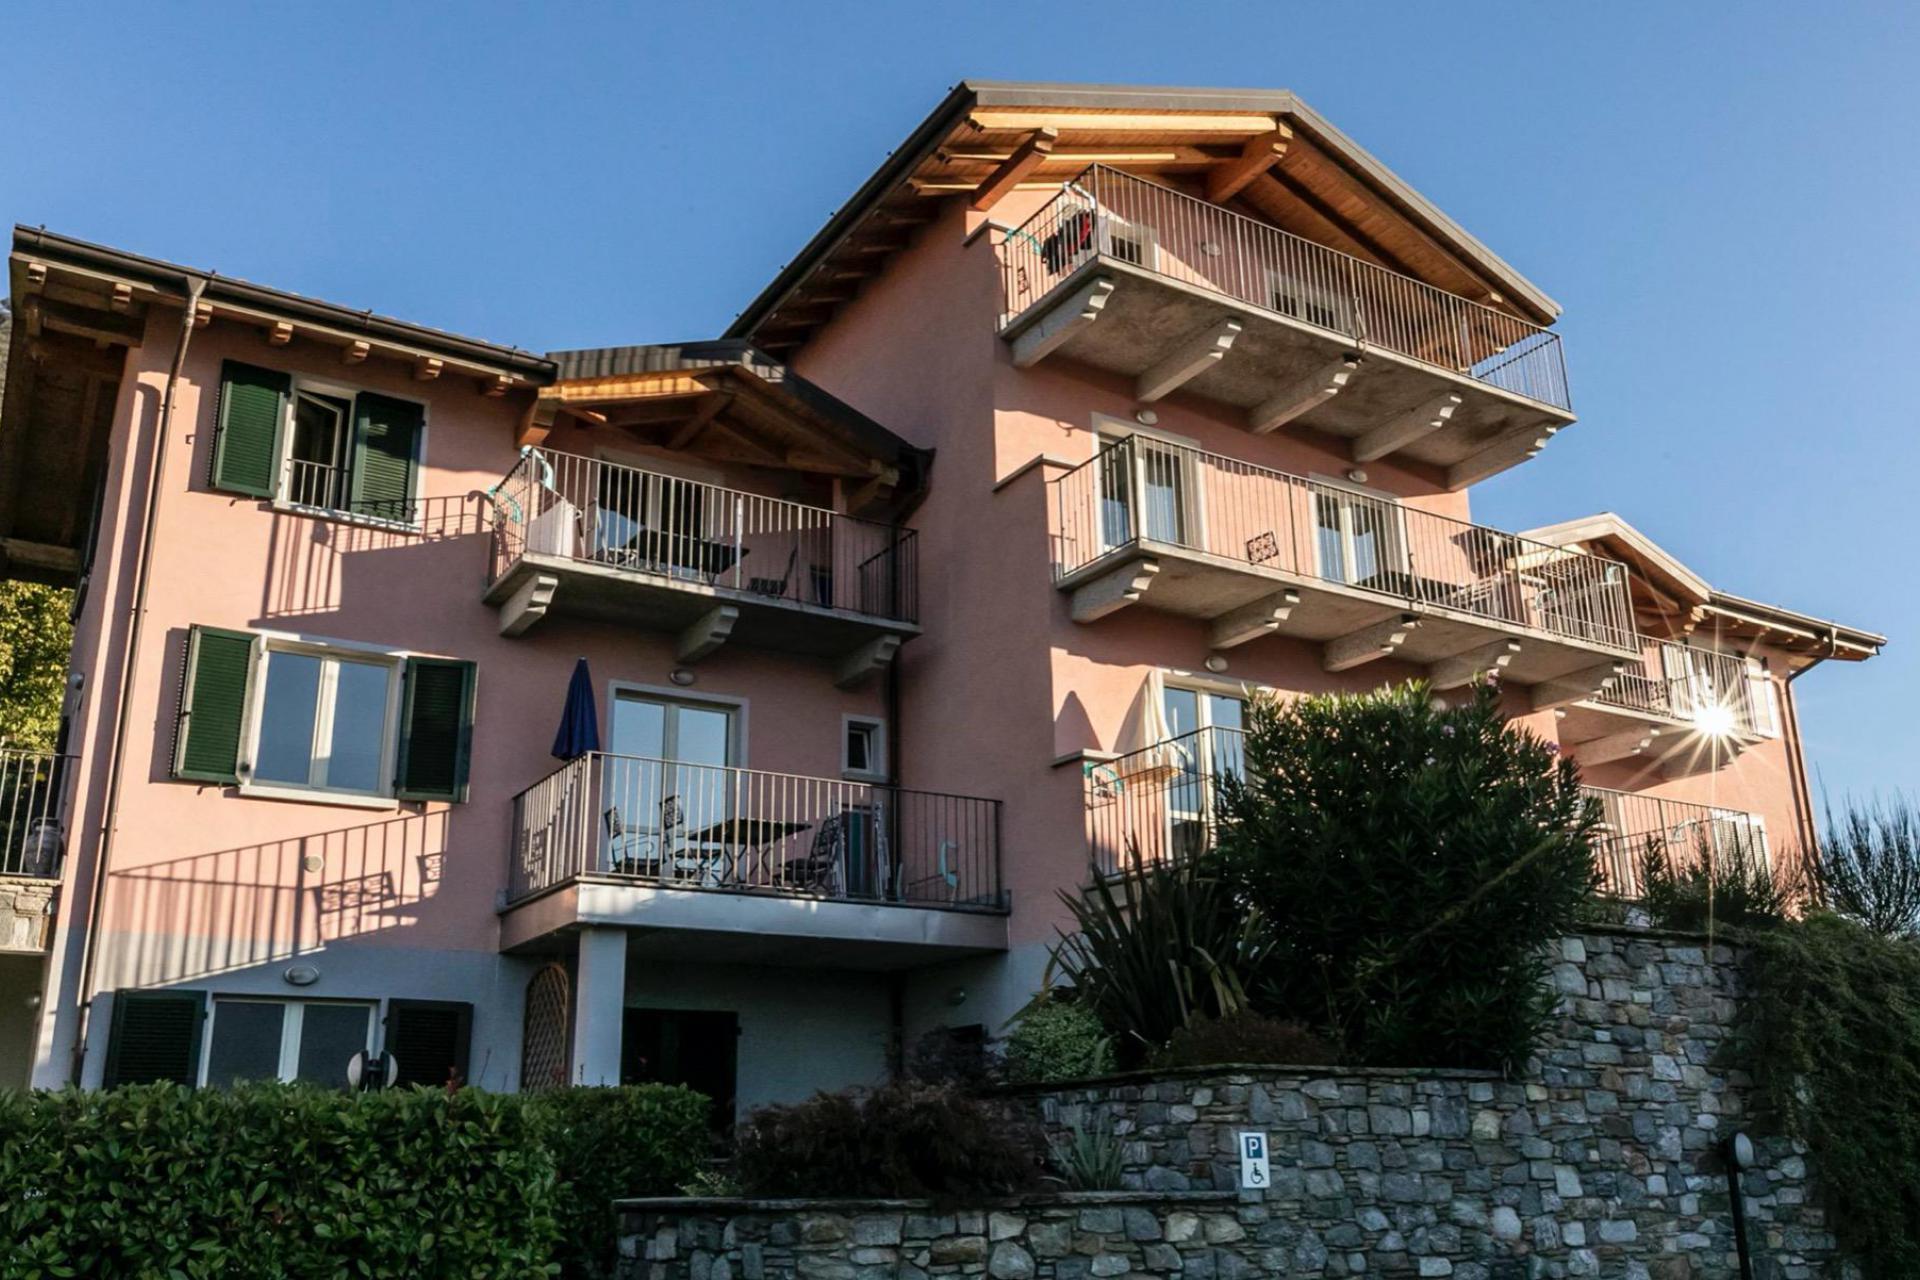 Agriturismo Lake Como and Lake Garda Residence lake Como, child-friendly and amazing views